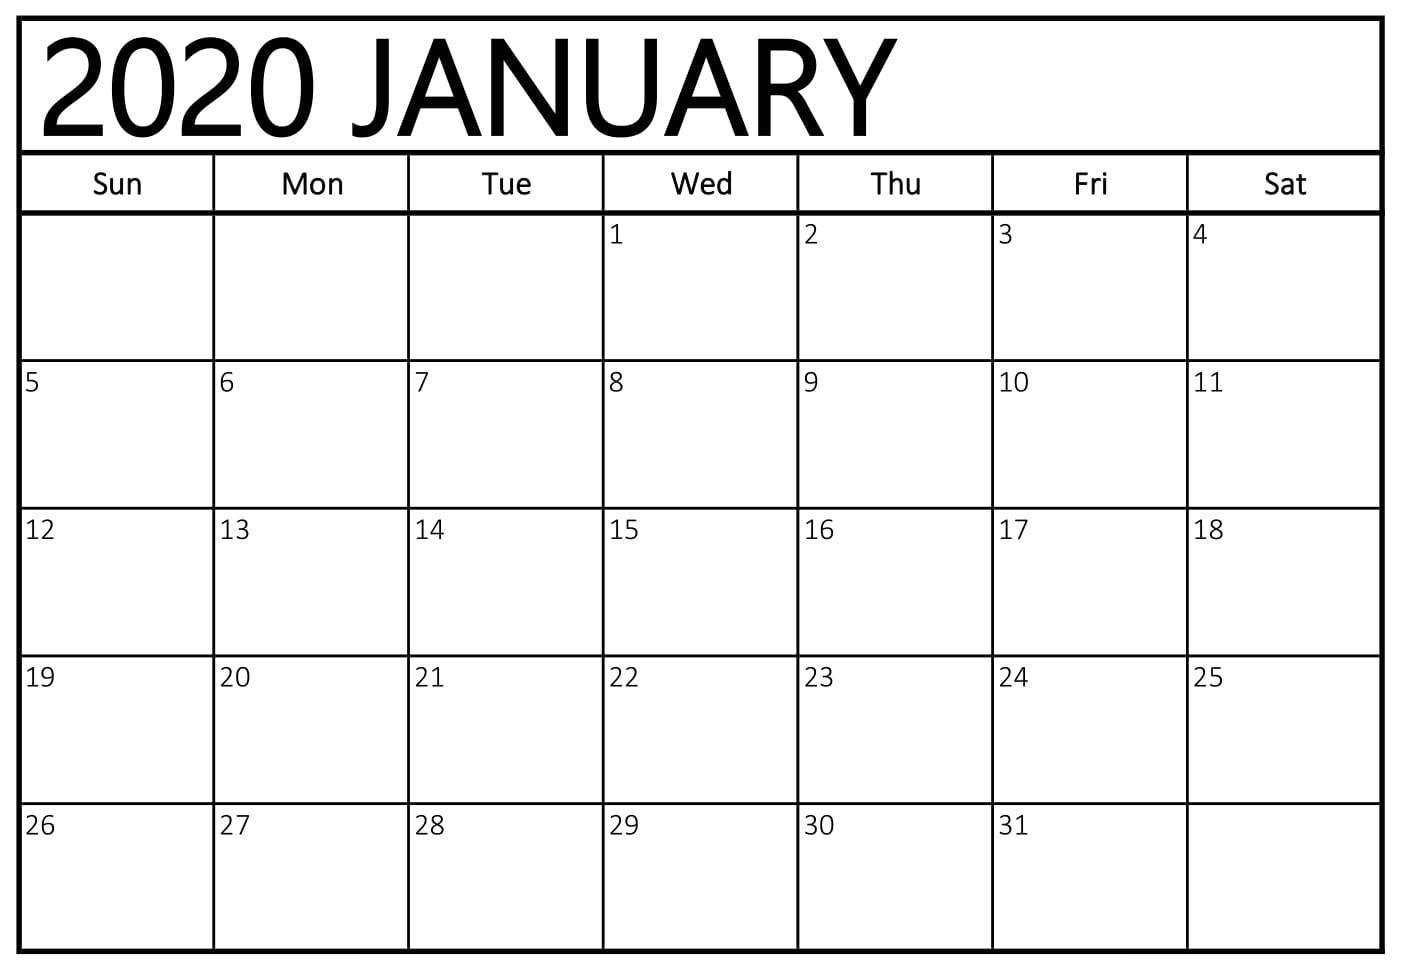 Printable Calendar January 2020 Pdf - 2019 Calendars For